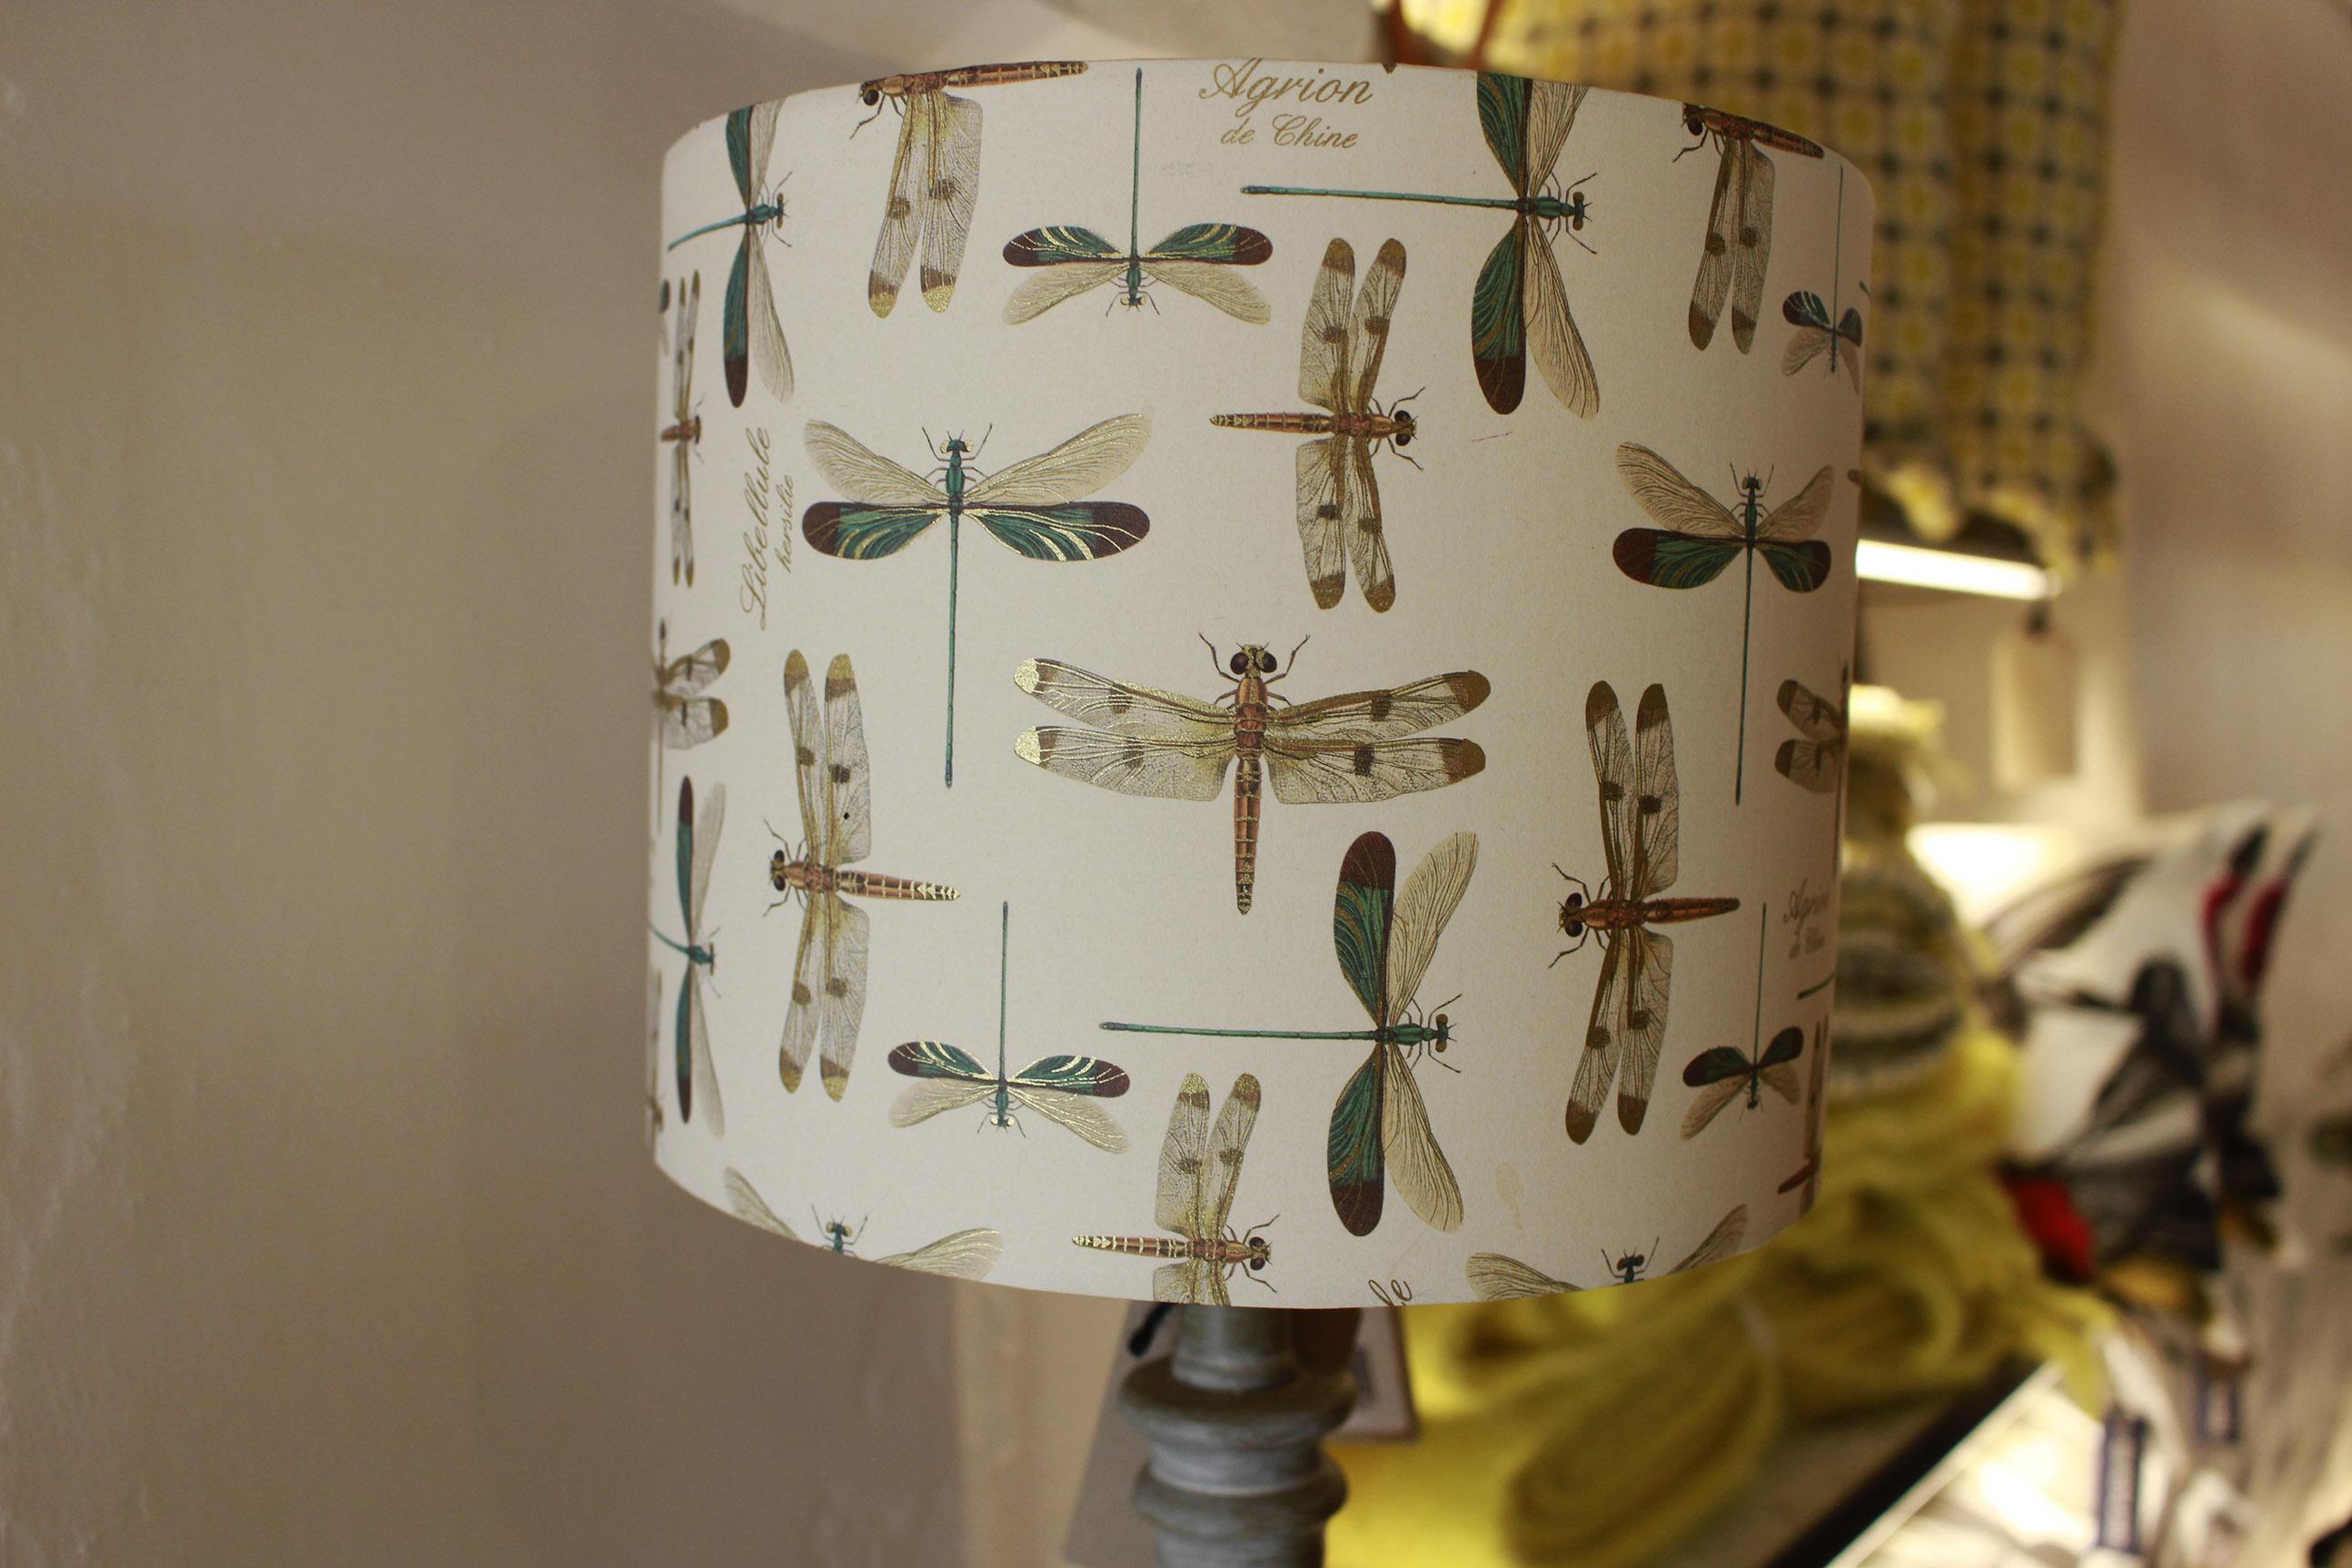 dragon fly, lamp shade, lamp stand